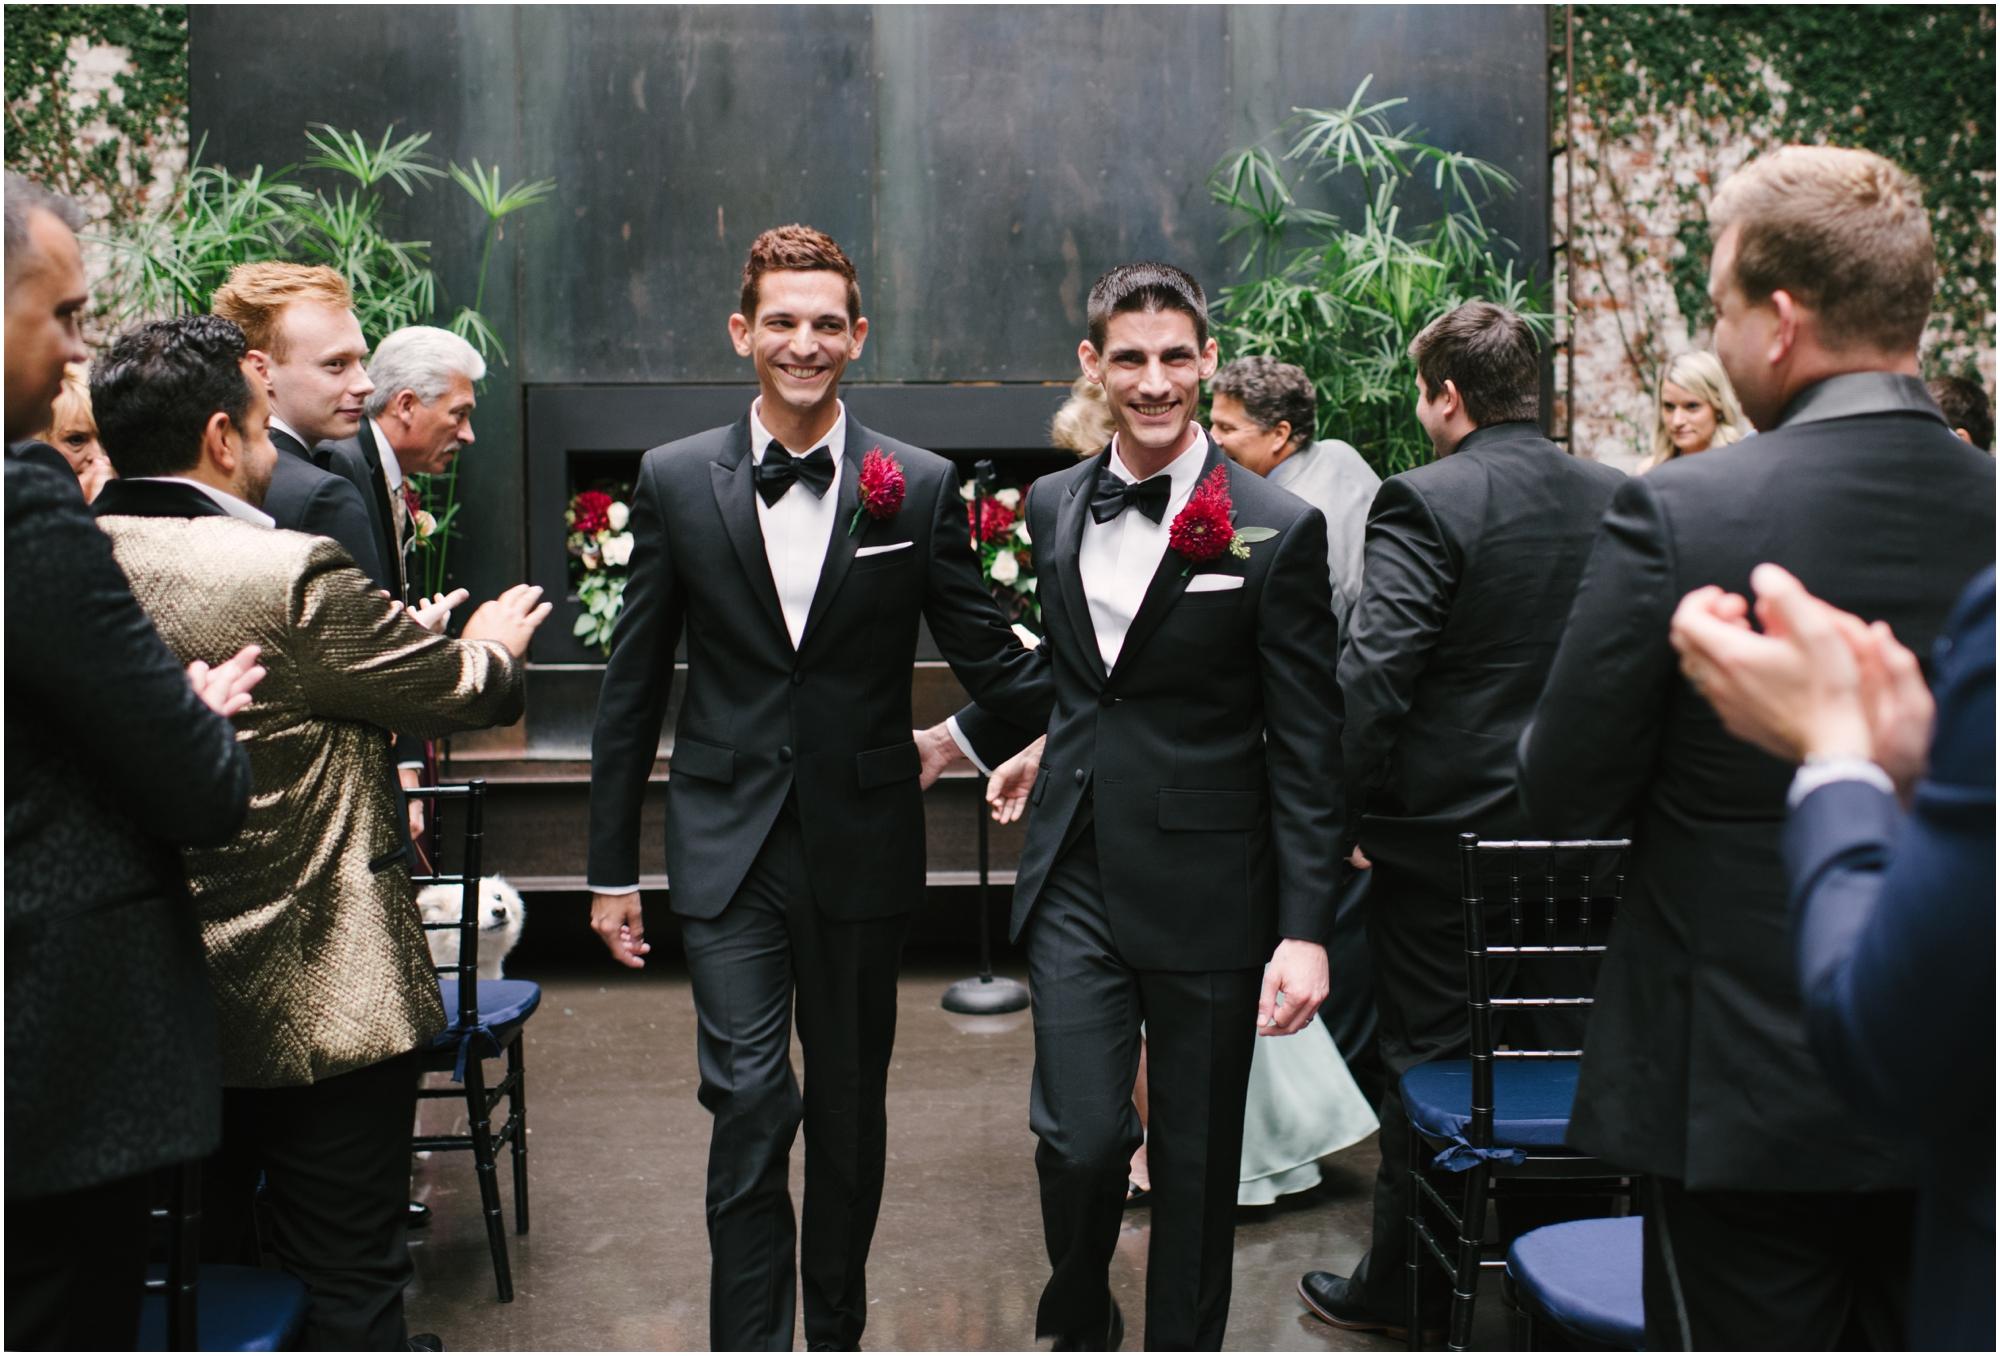 gay-wedding-photographer-williamsburgphotostudios-thefoundry-wedding-photographer_0013.jpg